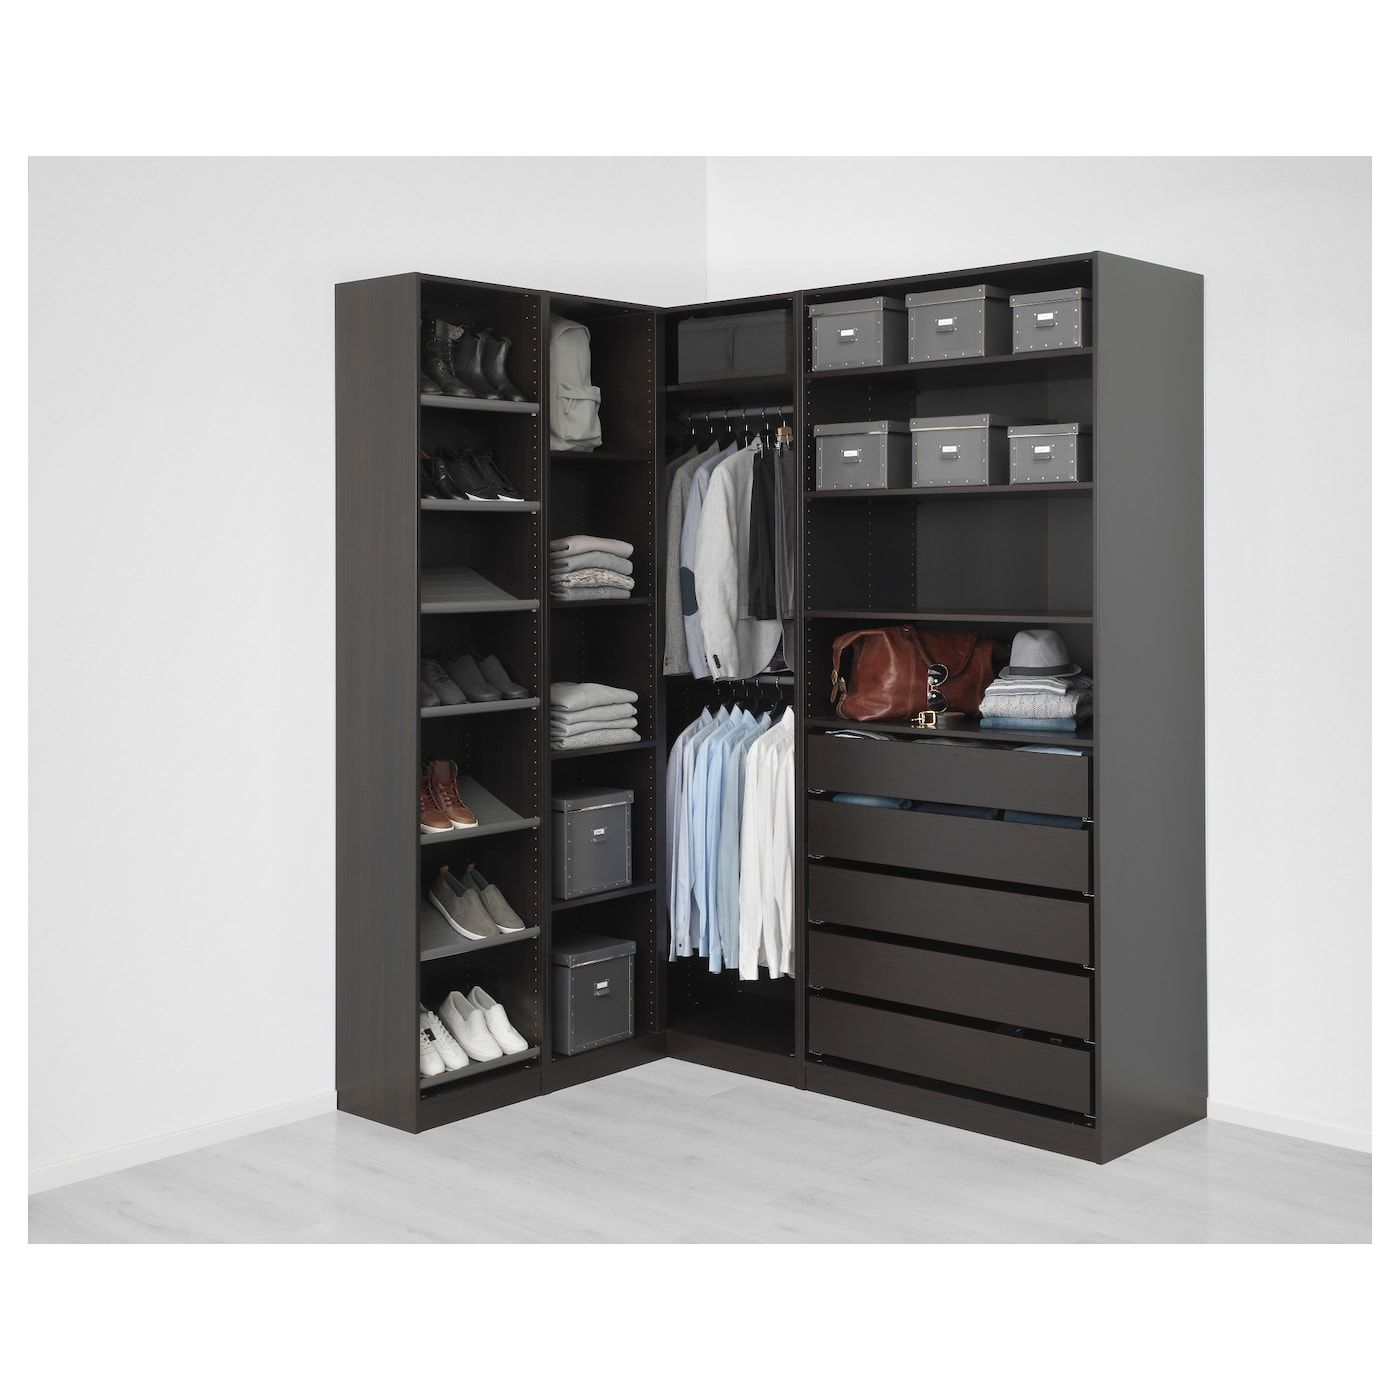 Dressing De Coin Ikea pax corner wardrobe - black-brown 63 1/8/73 7/8x93 1/8